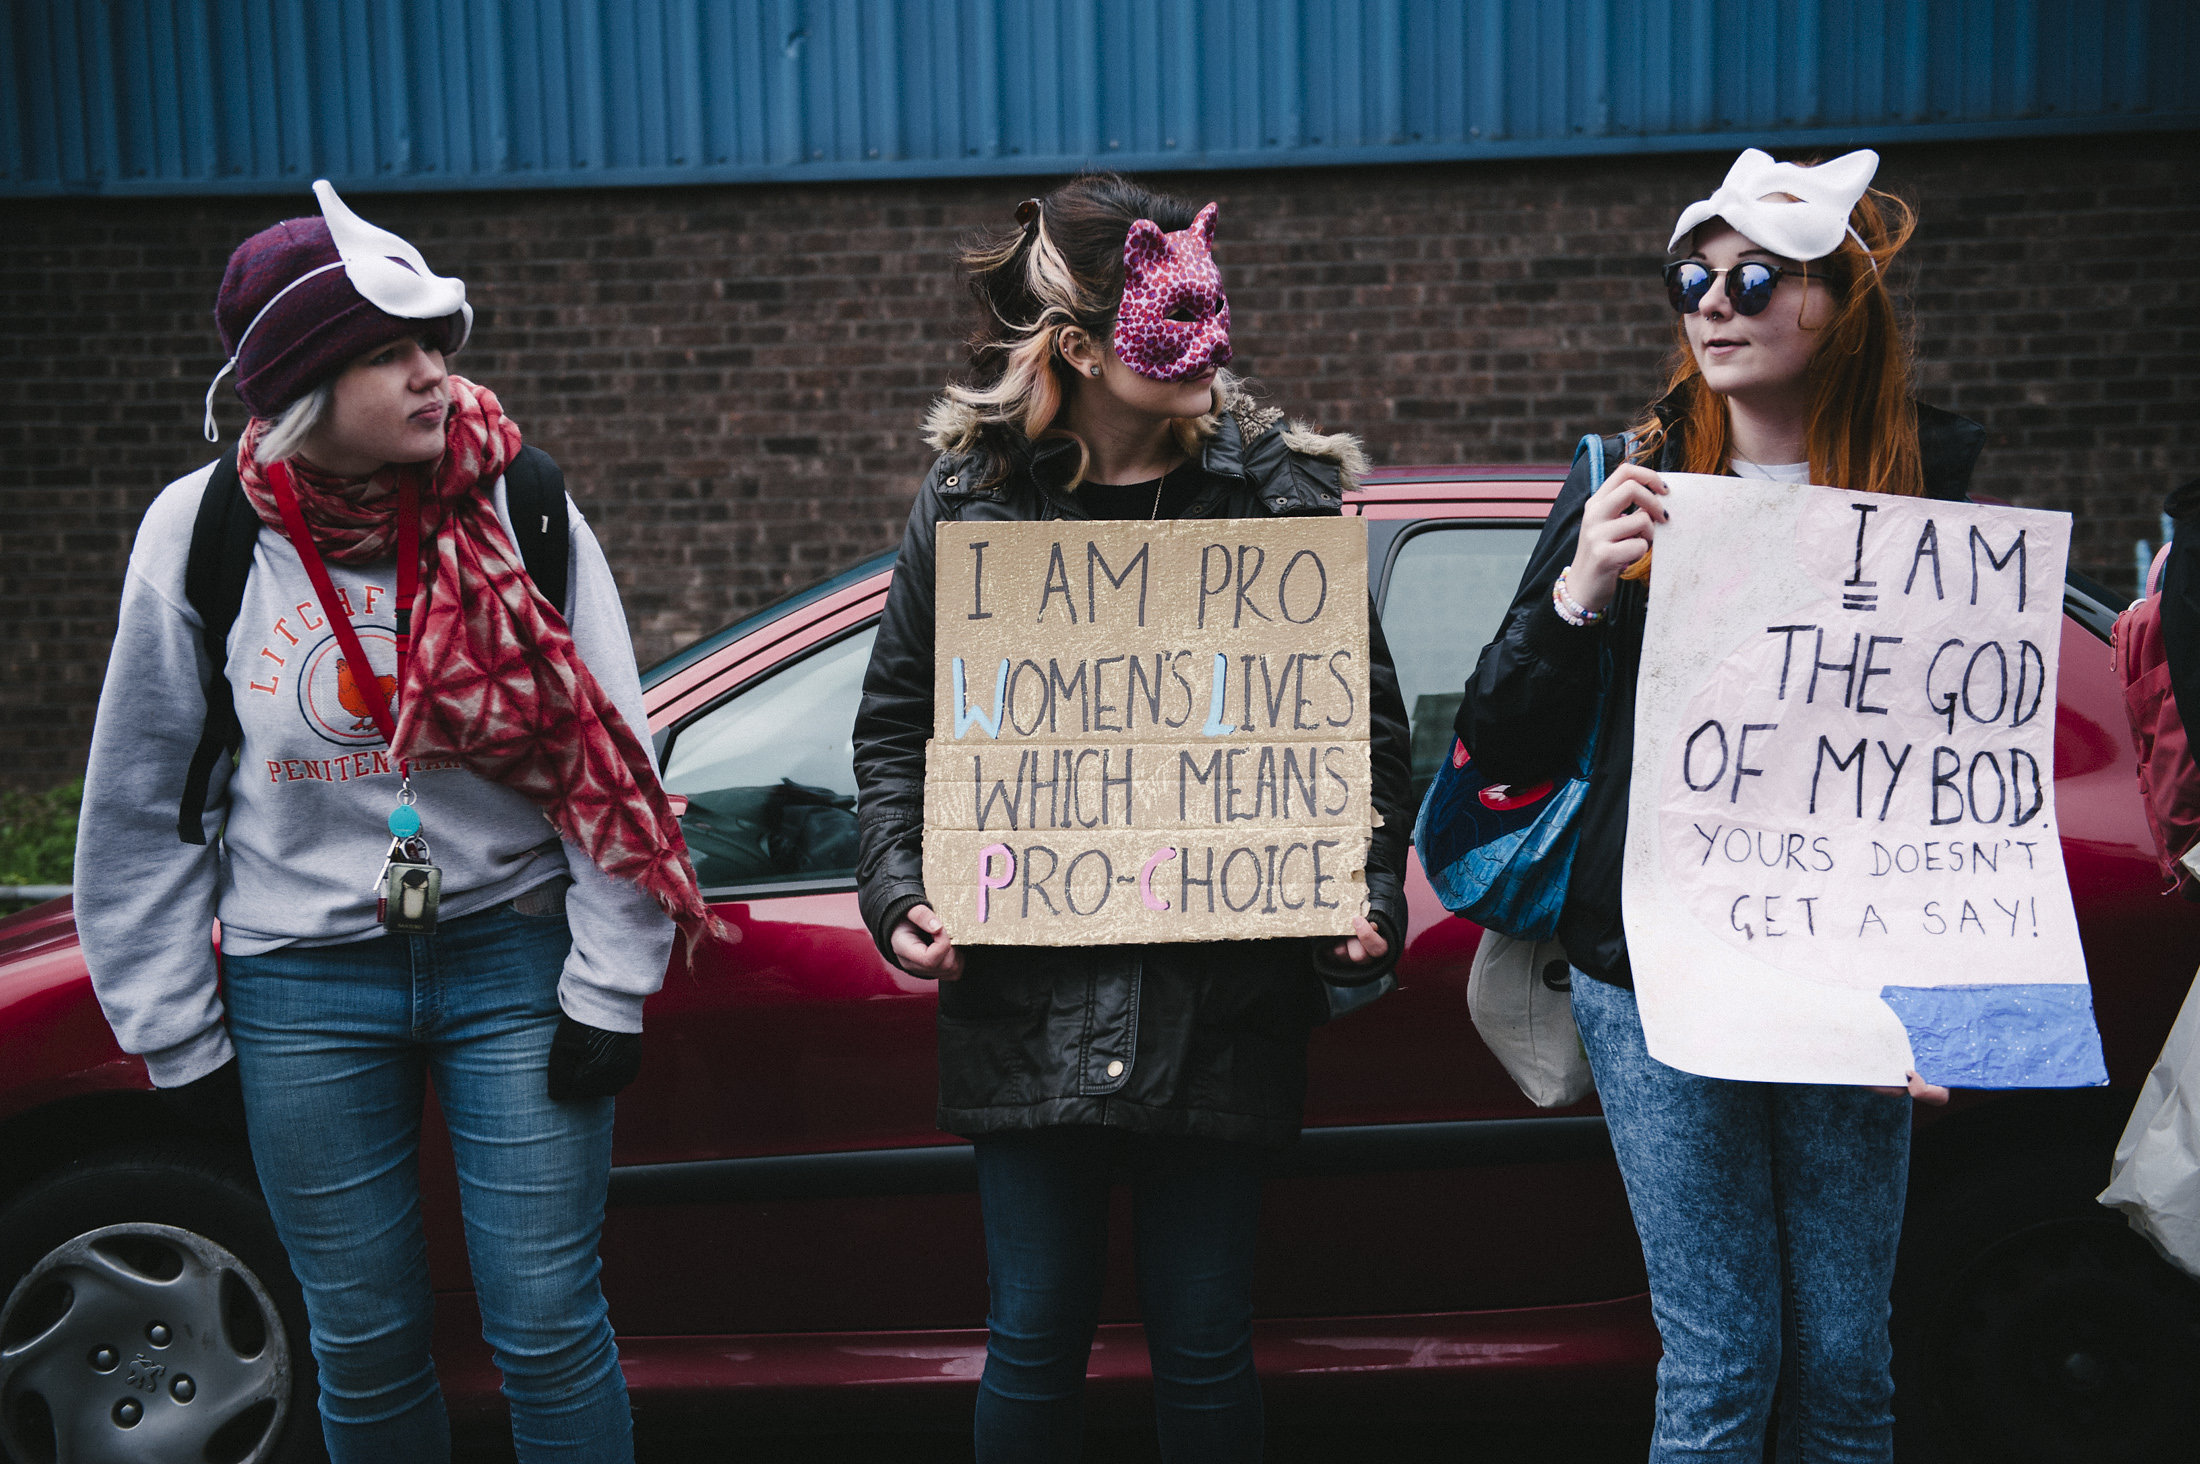 FeministFightback_LyndaLaird-5267